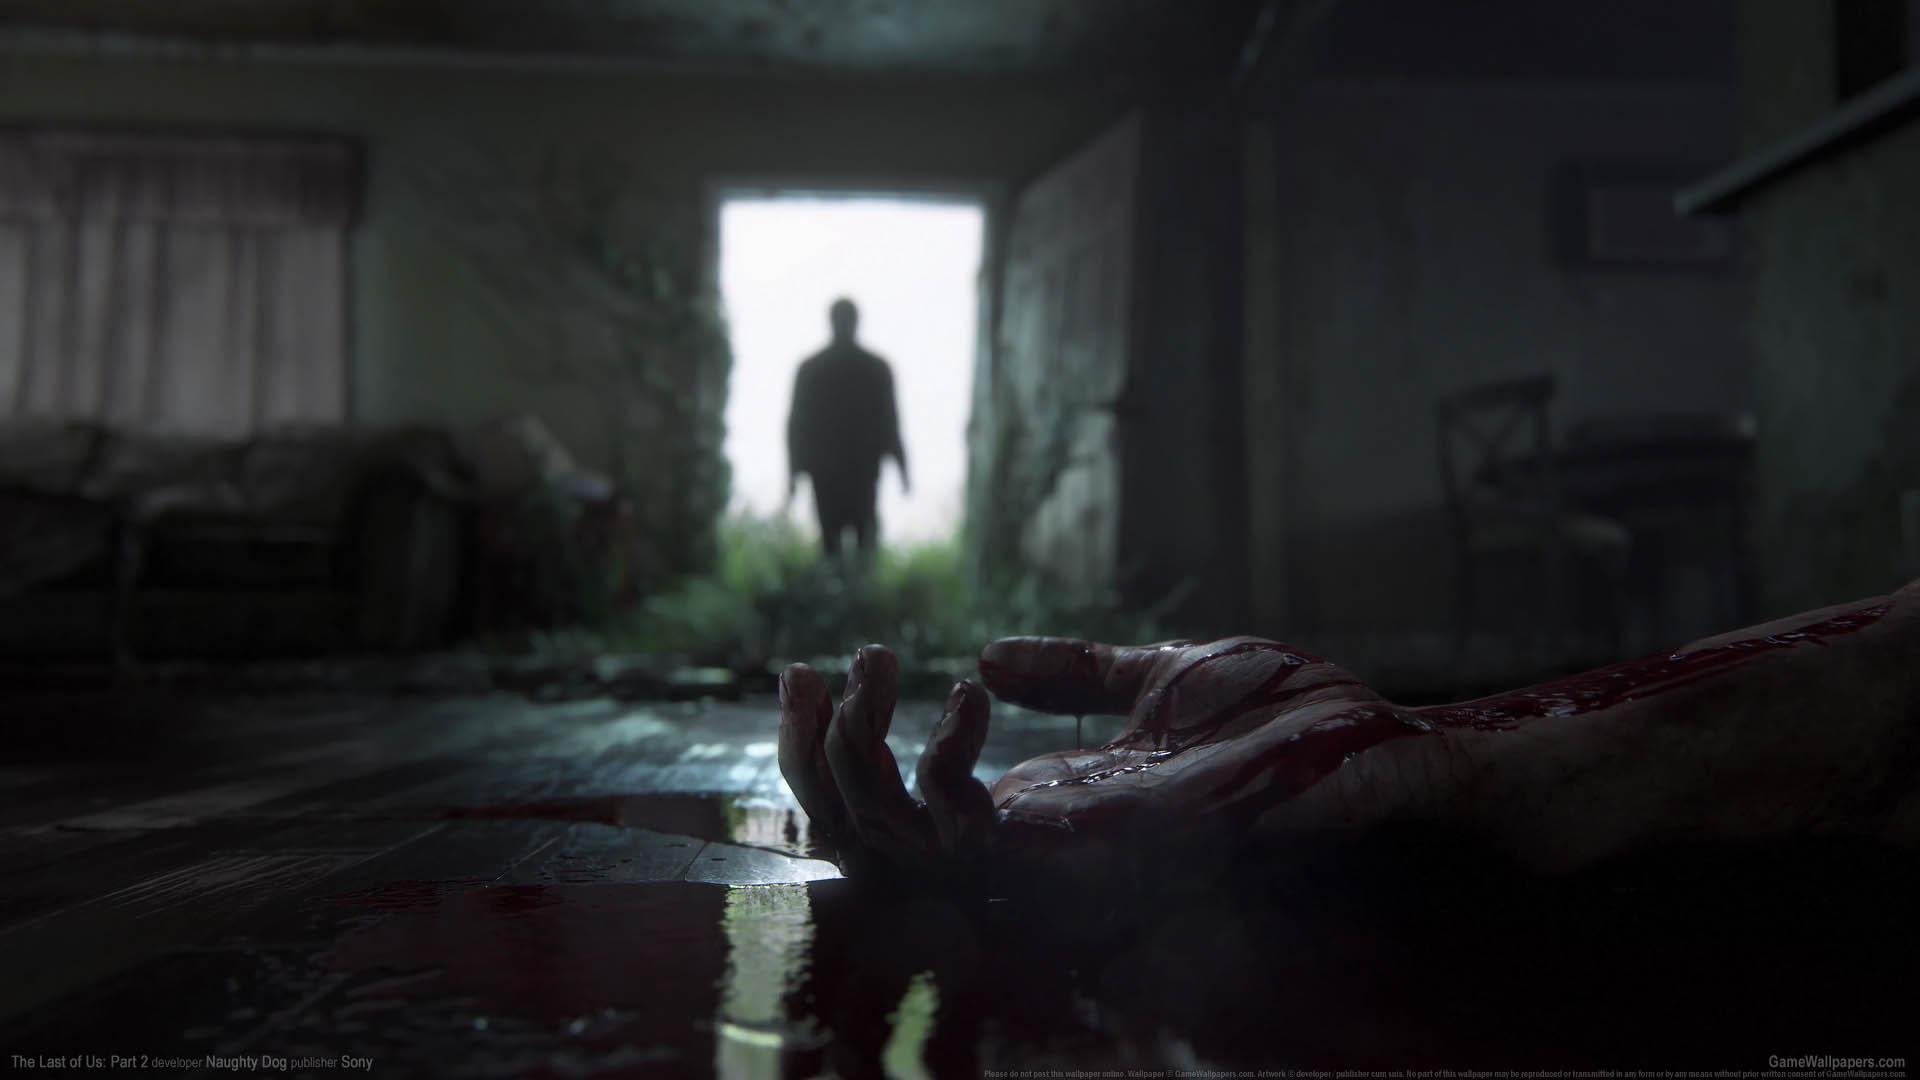 The Last Of Us Part 2 Wallpaper 01 1920x1080